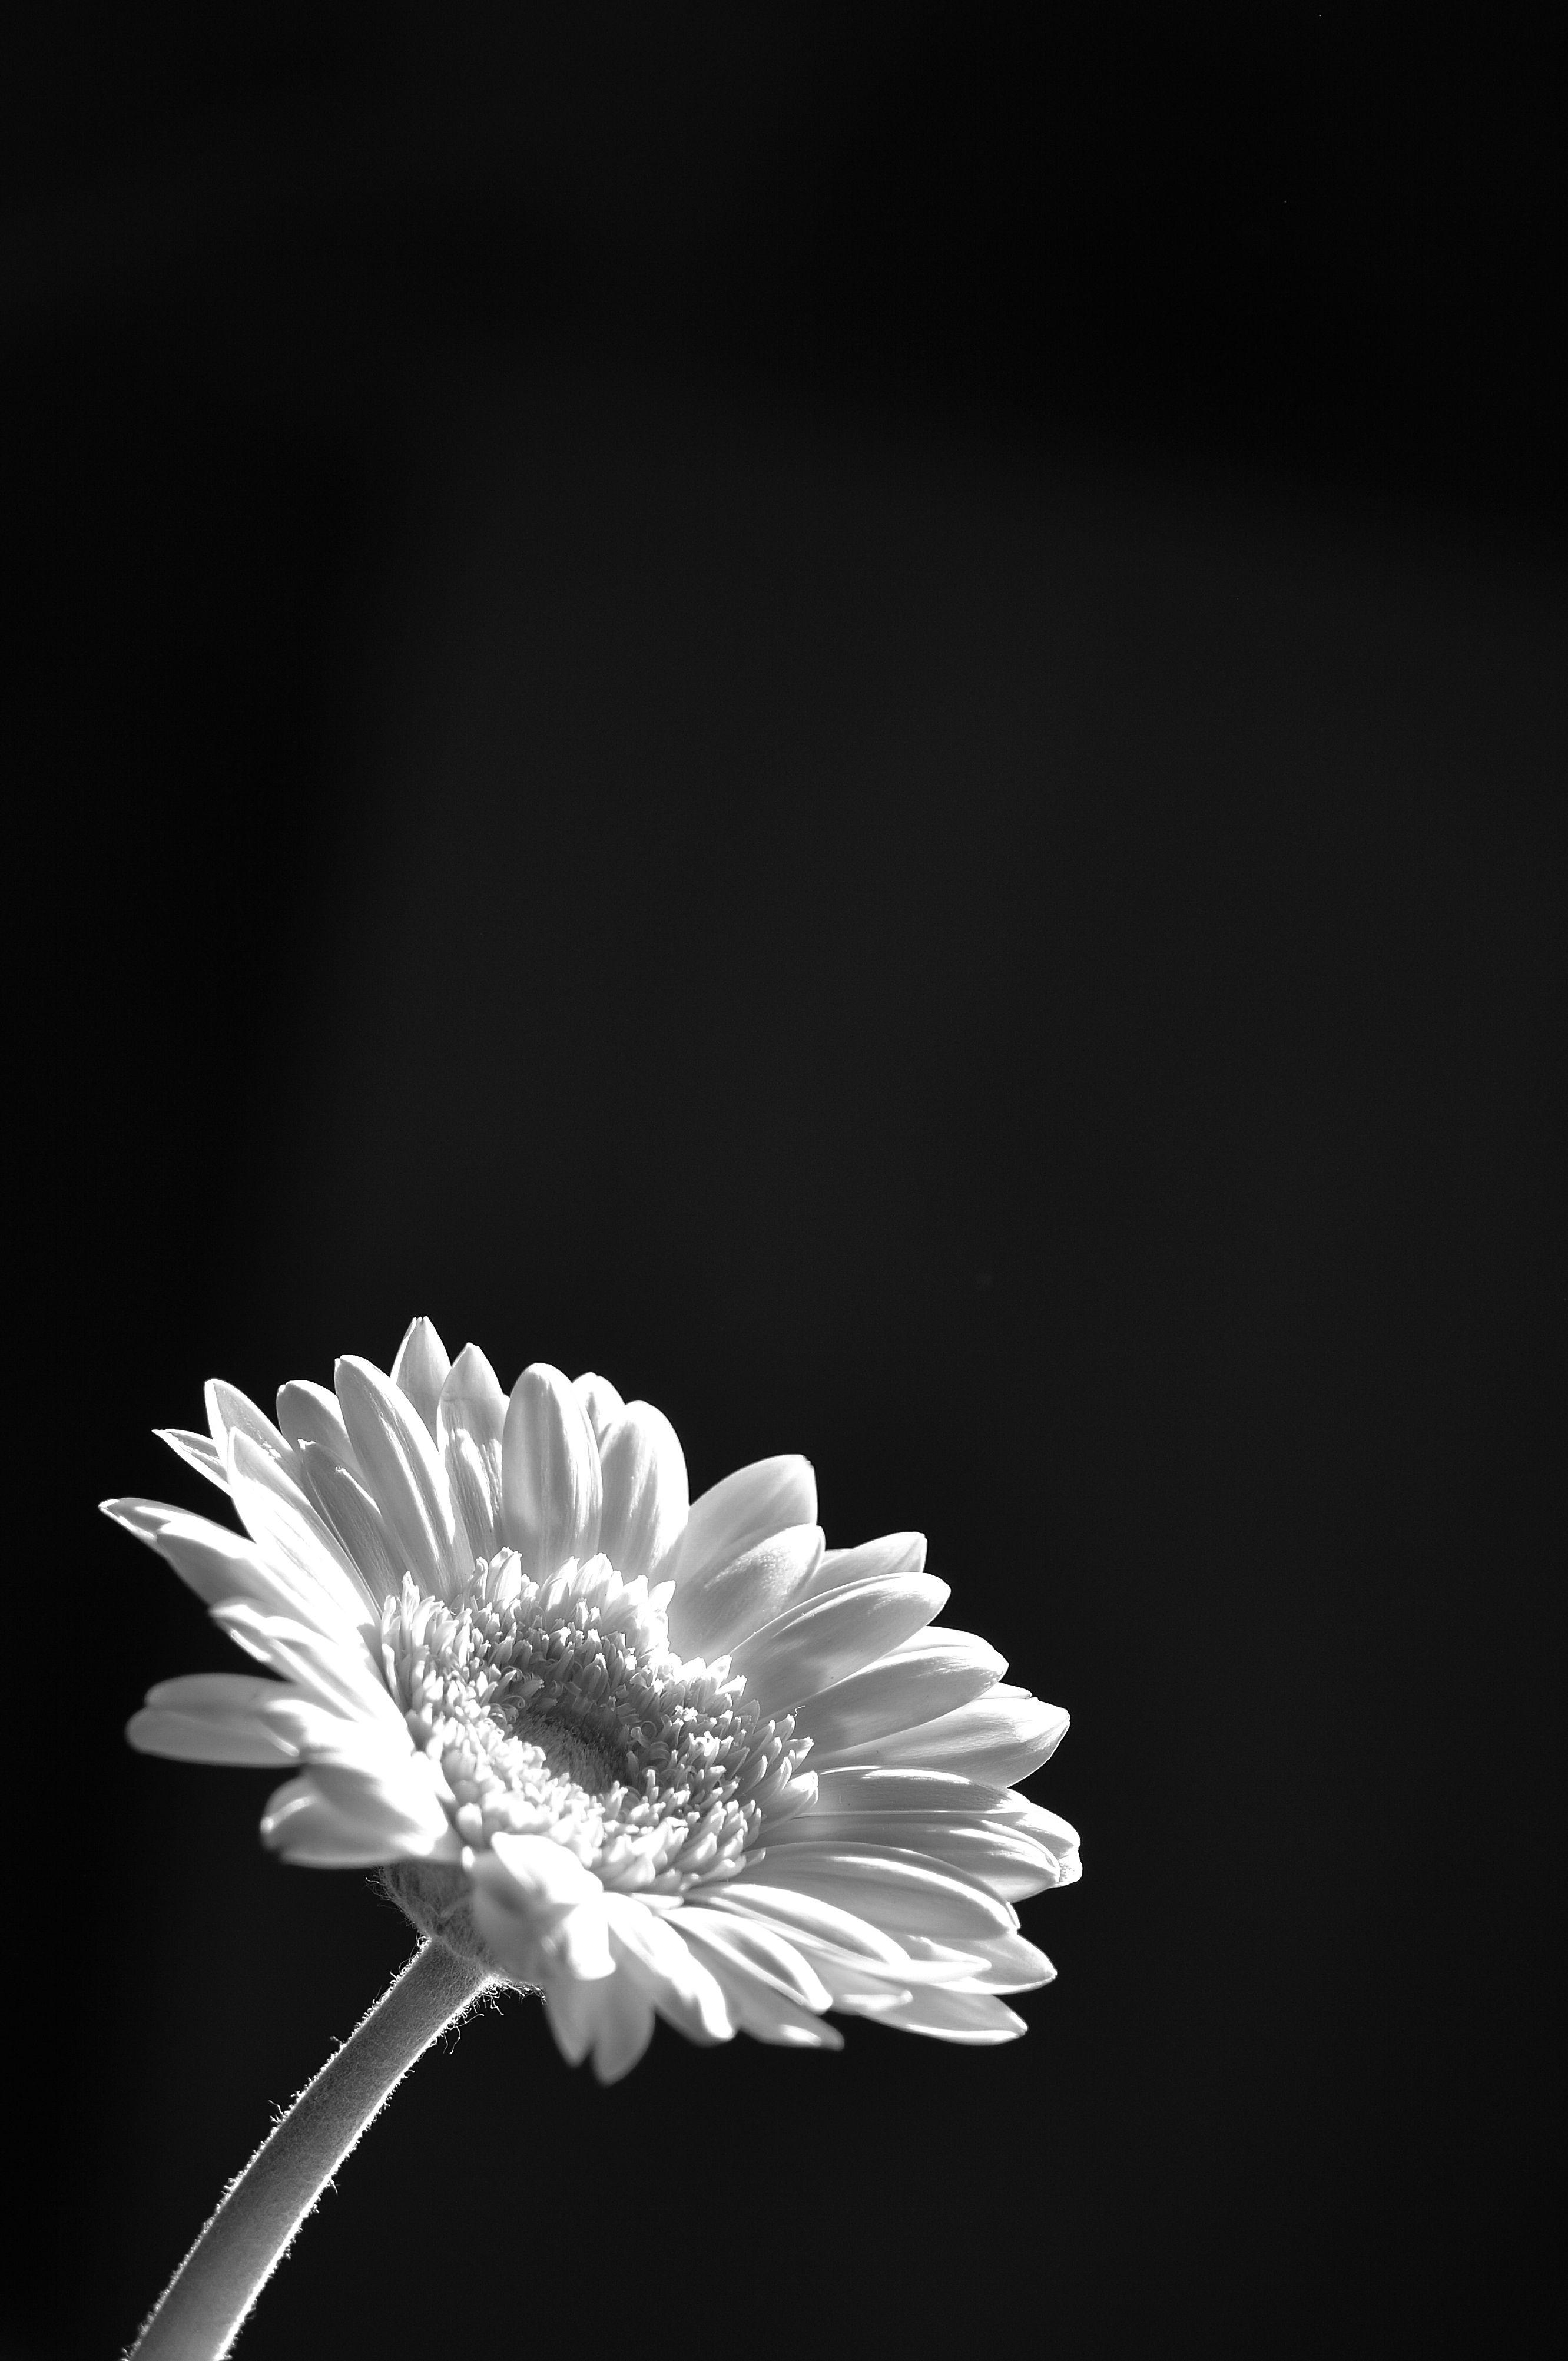 Pin by diego raimonda on flowers bw pinterest flowers